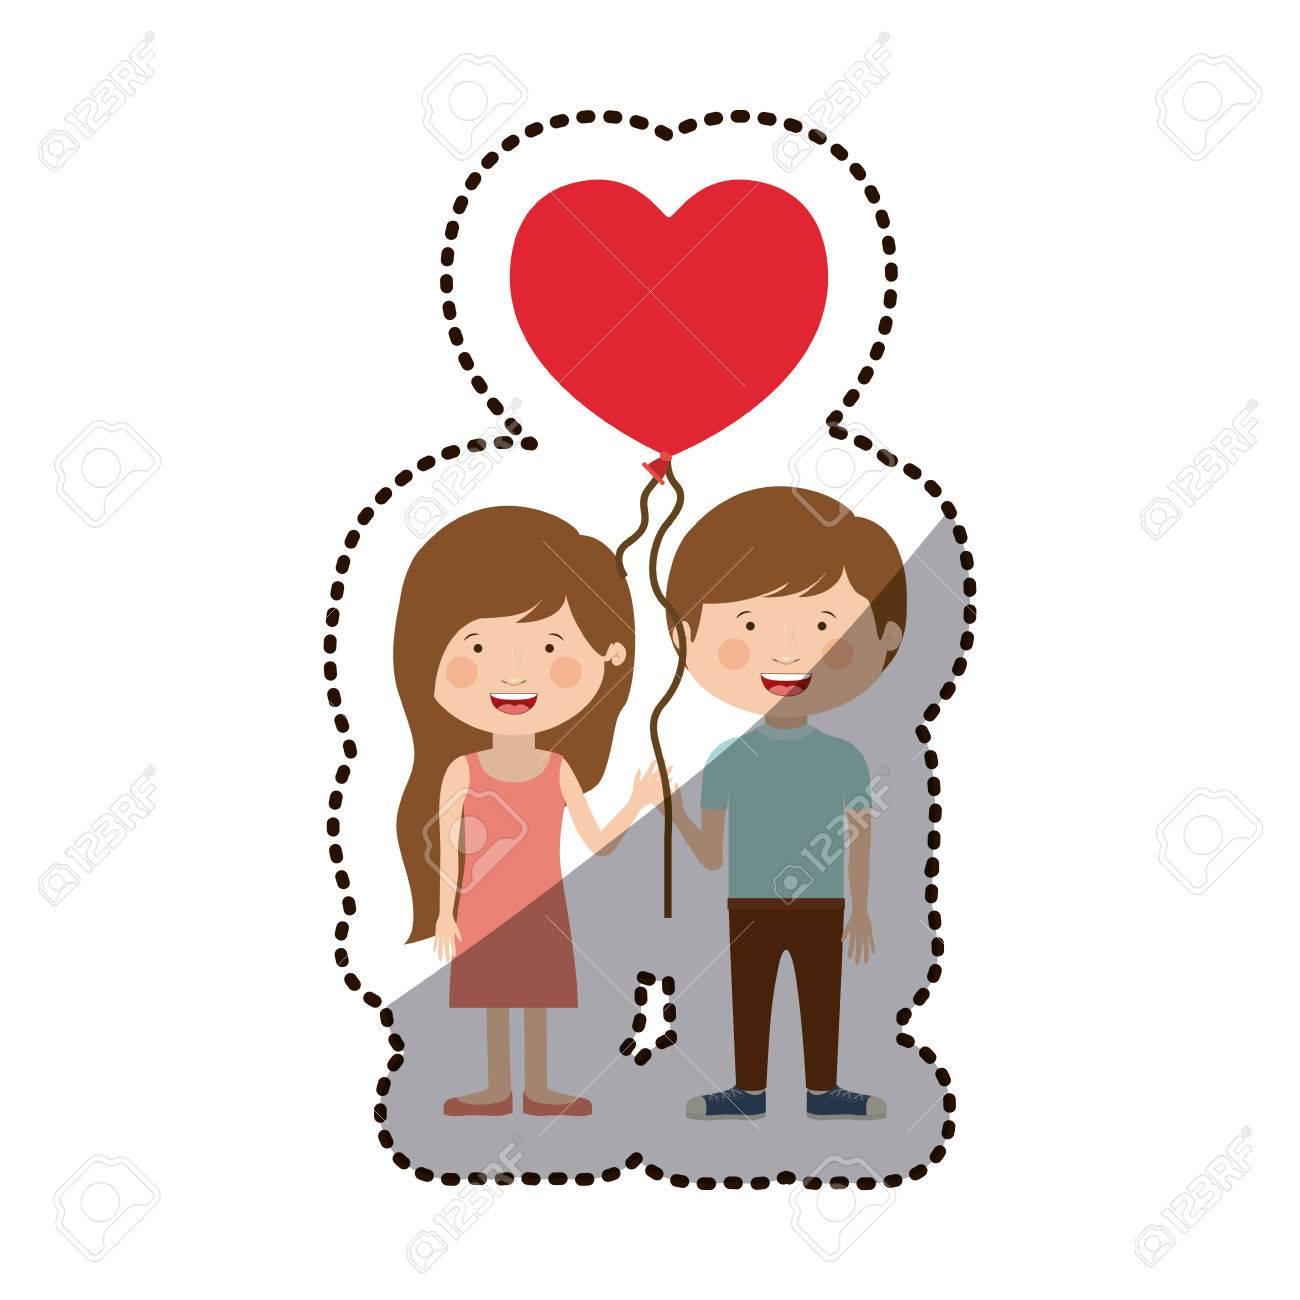 Boy And Girl Cartoon With Heart Balloon Icon Kid Childhood Little